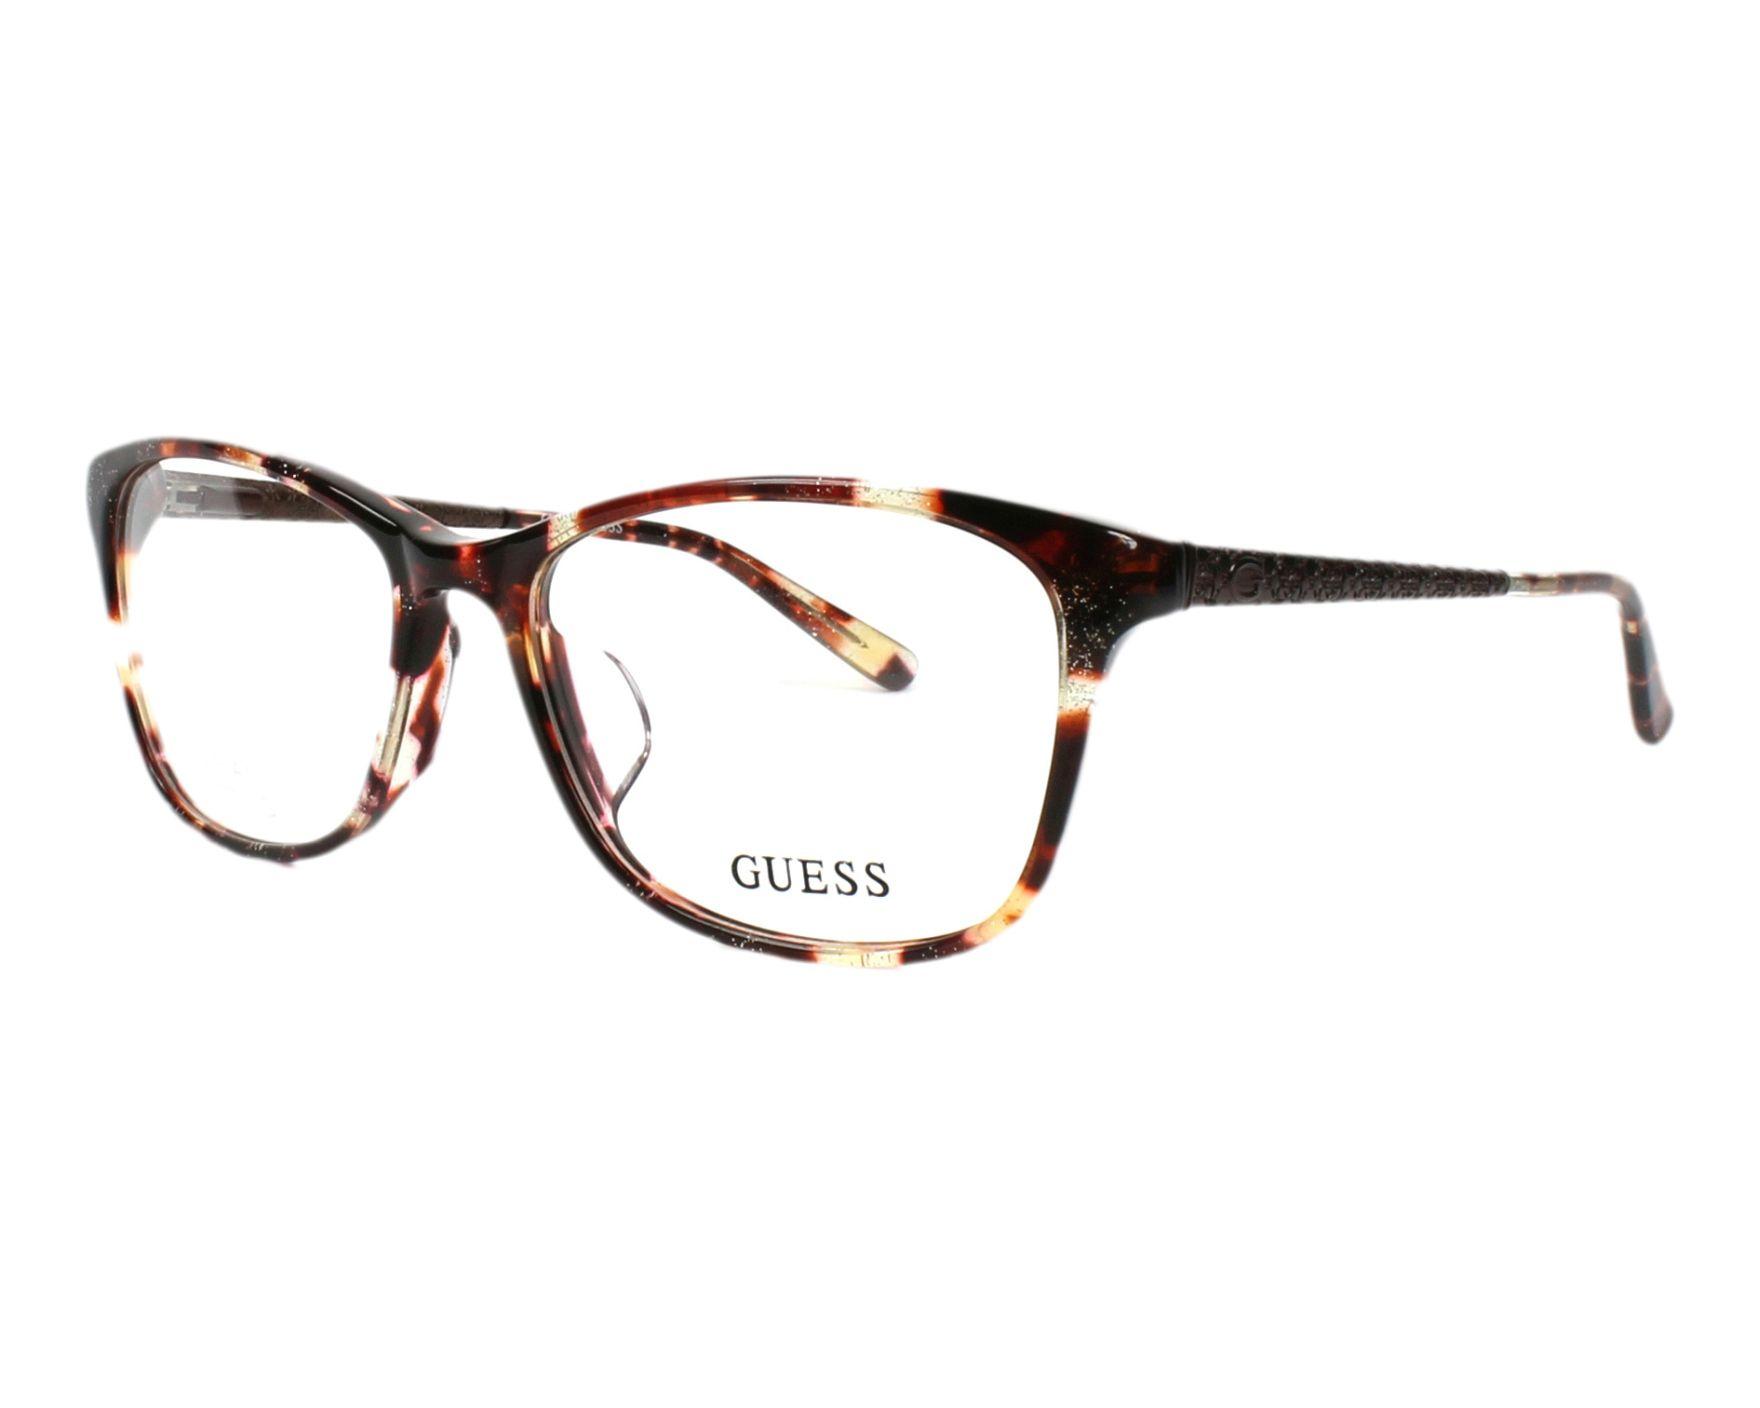 Guess Eyeglasses GU-2500 047 Havana | visio-net.com